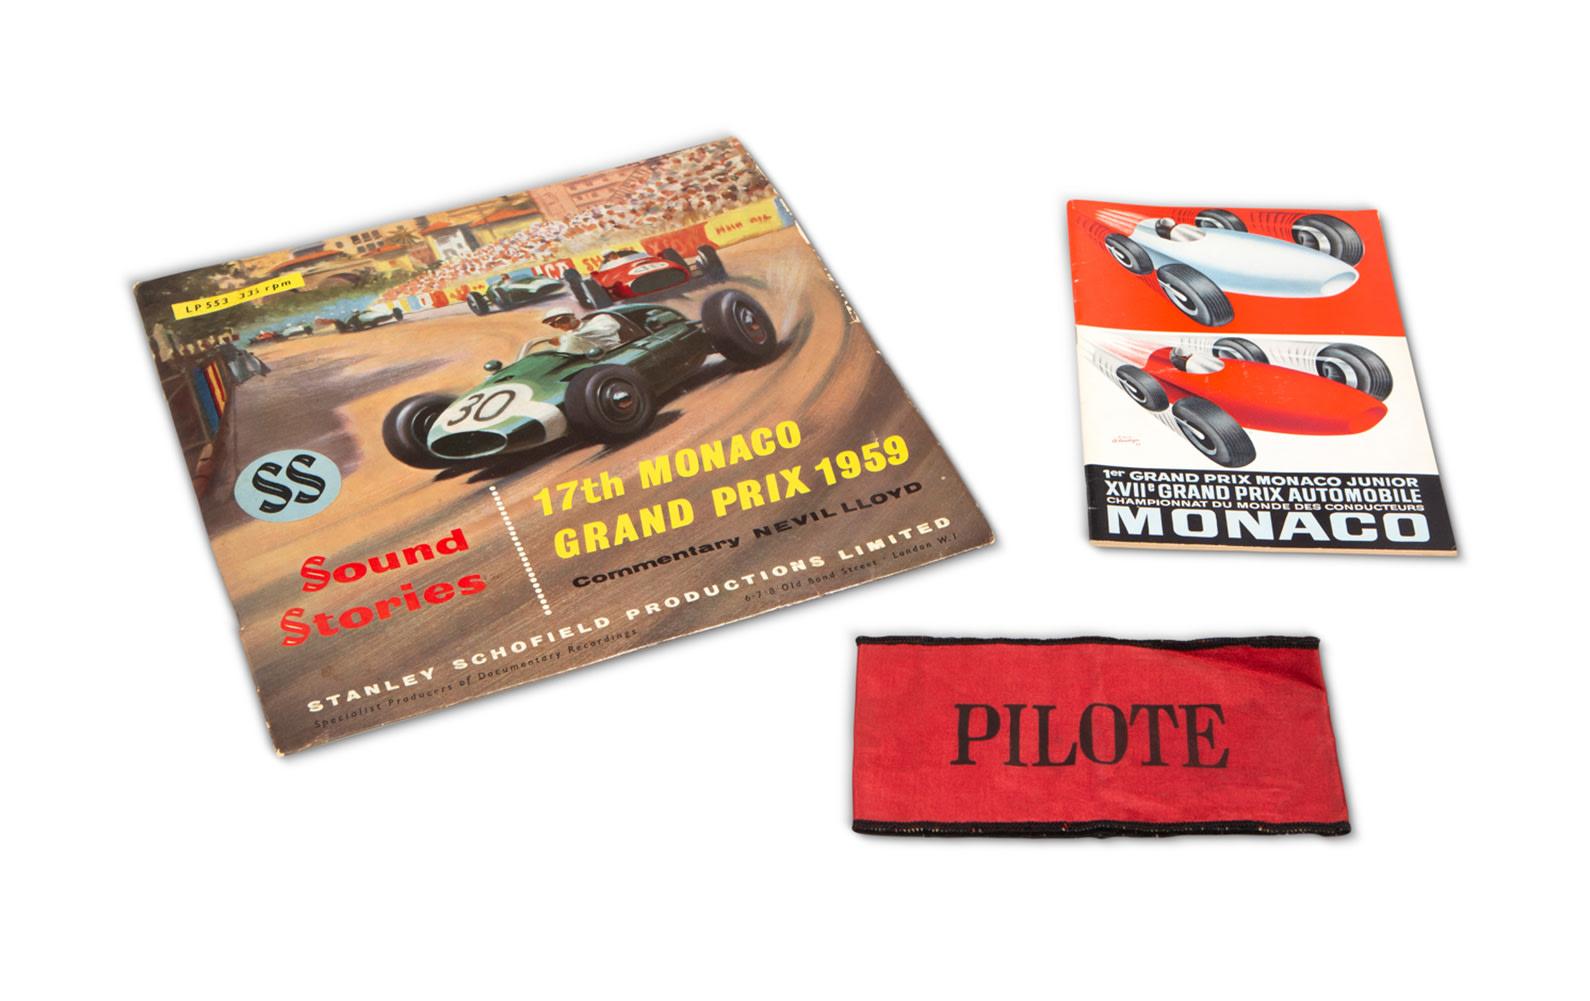 1959 Monaco Grand Prix Official Race Program, Vinyl Record, and Driver Armband